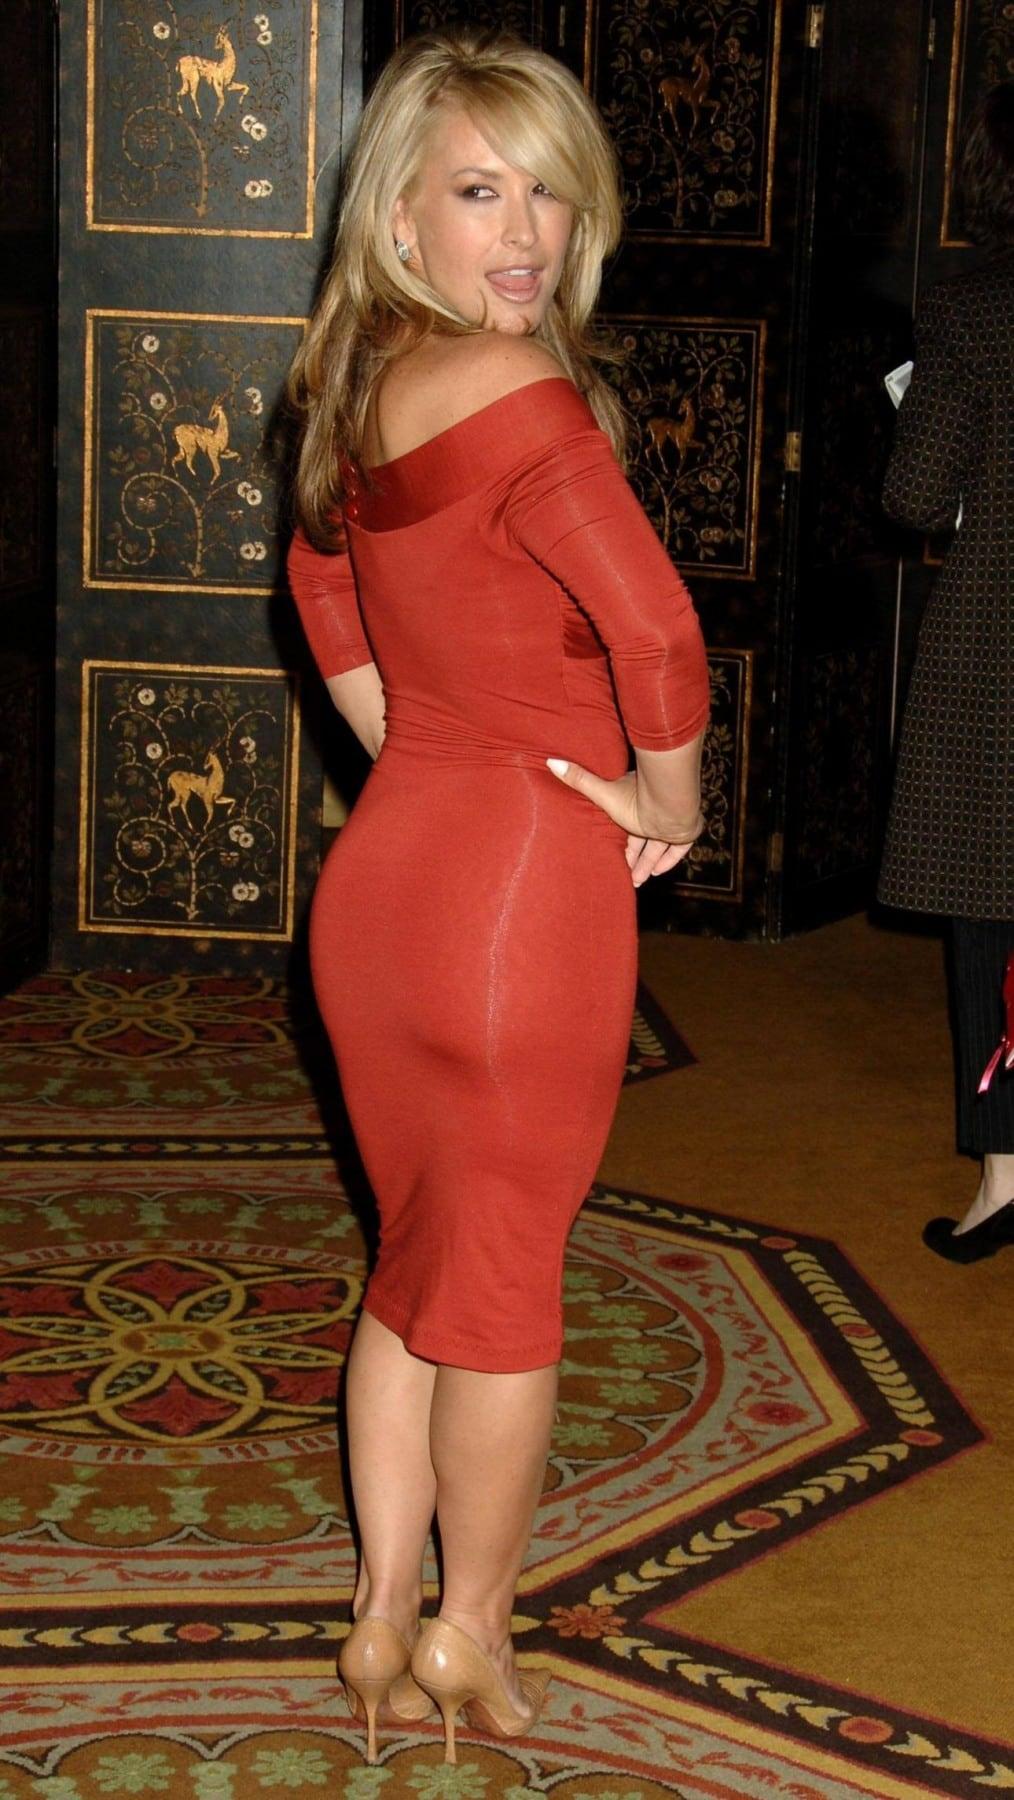 Anastacia McPherson nudes (64 photo) Hot, 2018, braless